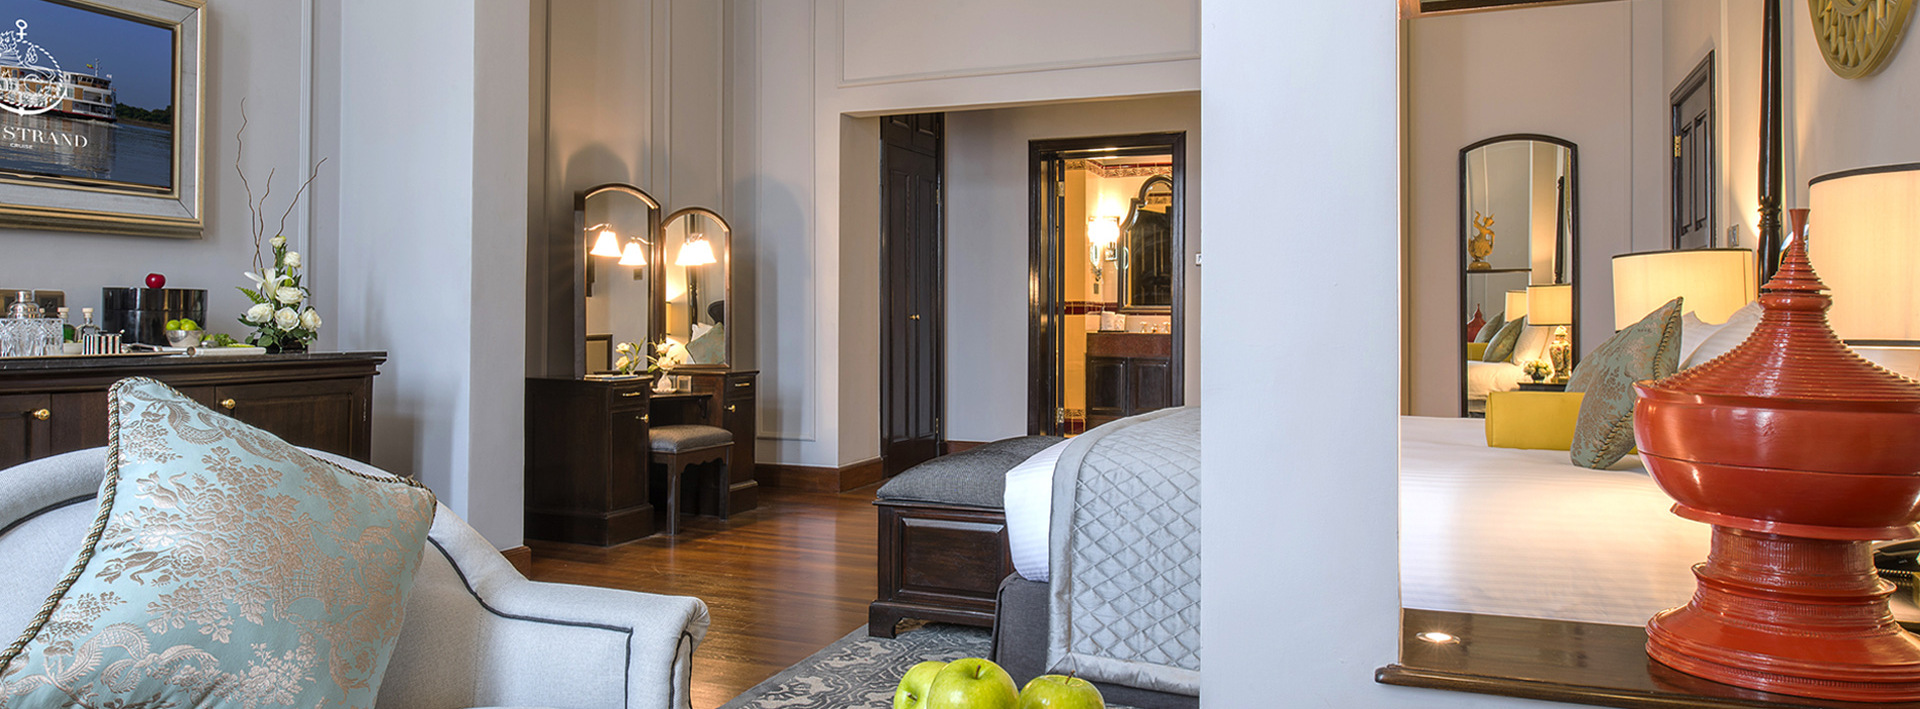 superior-suite-strand-hotel-yangon